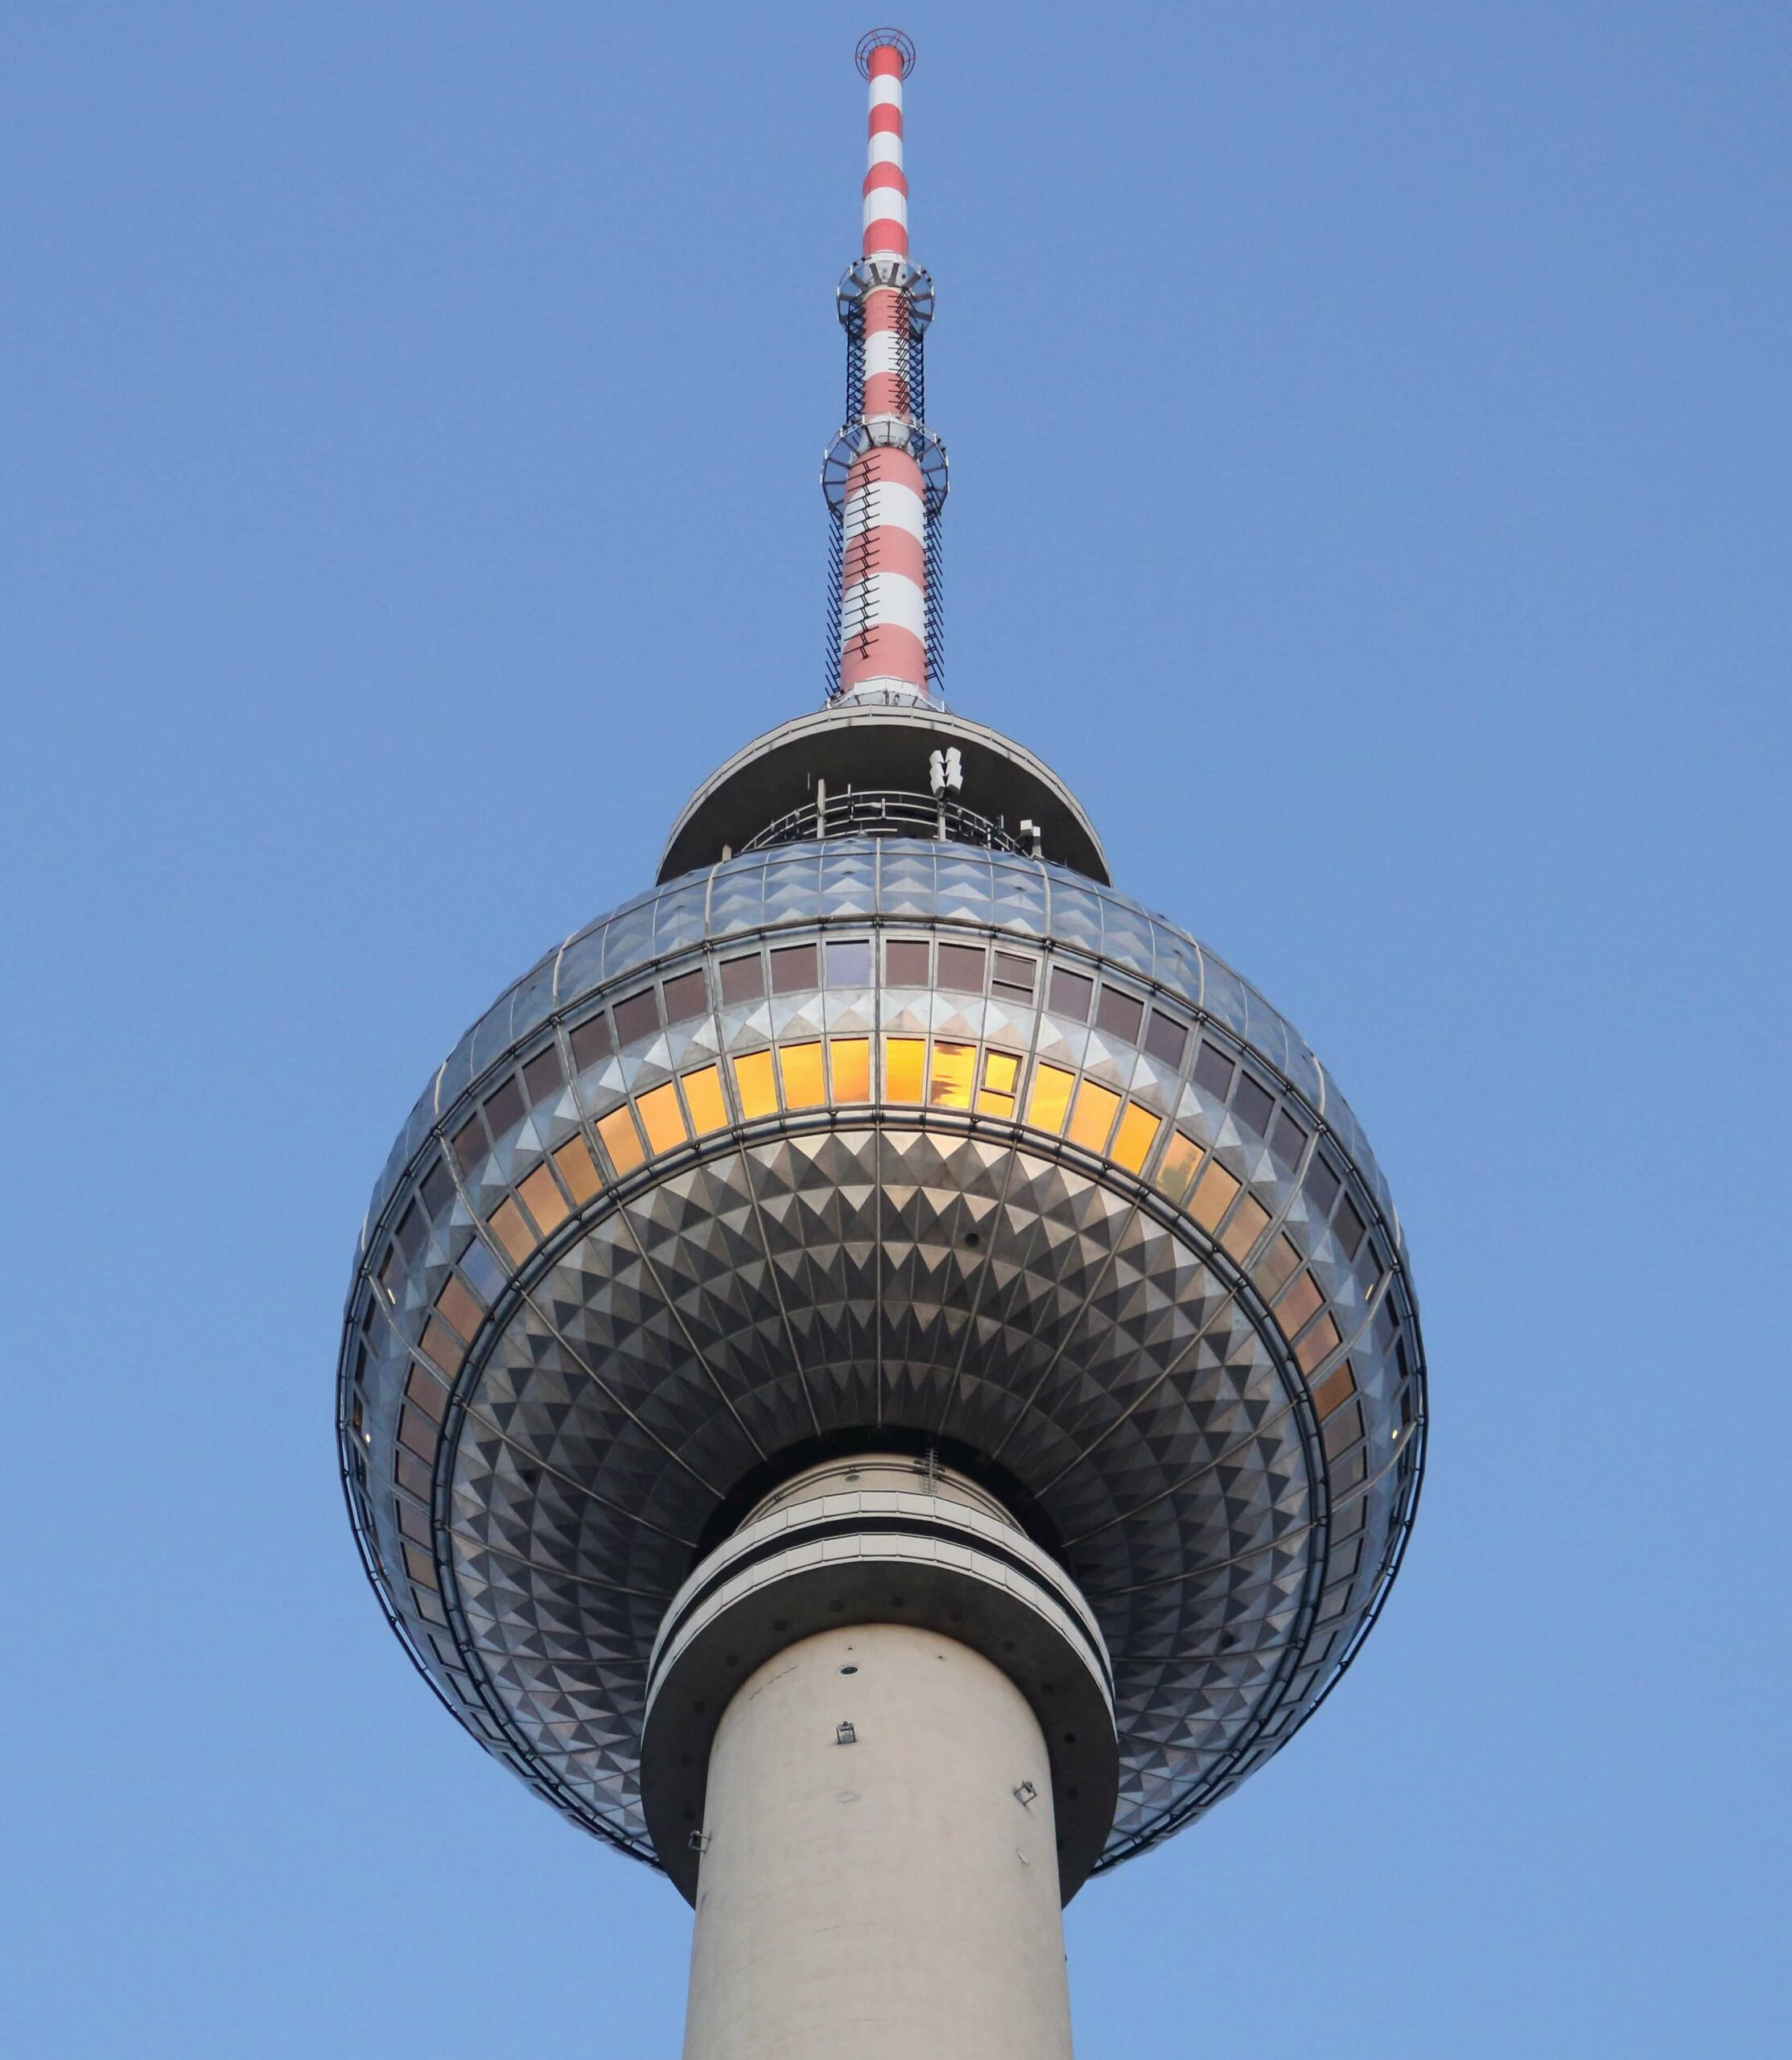 Berliner Fernsehturm - Panoramastrasse 1A - 10178 Berlin